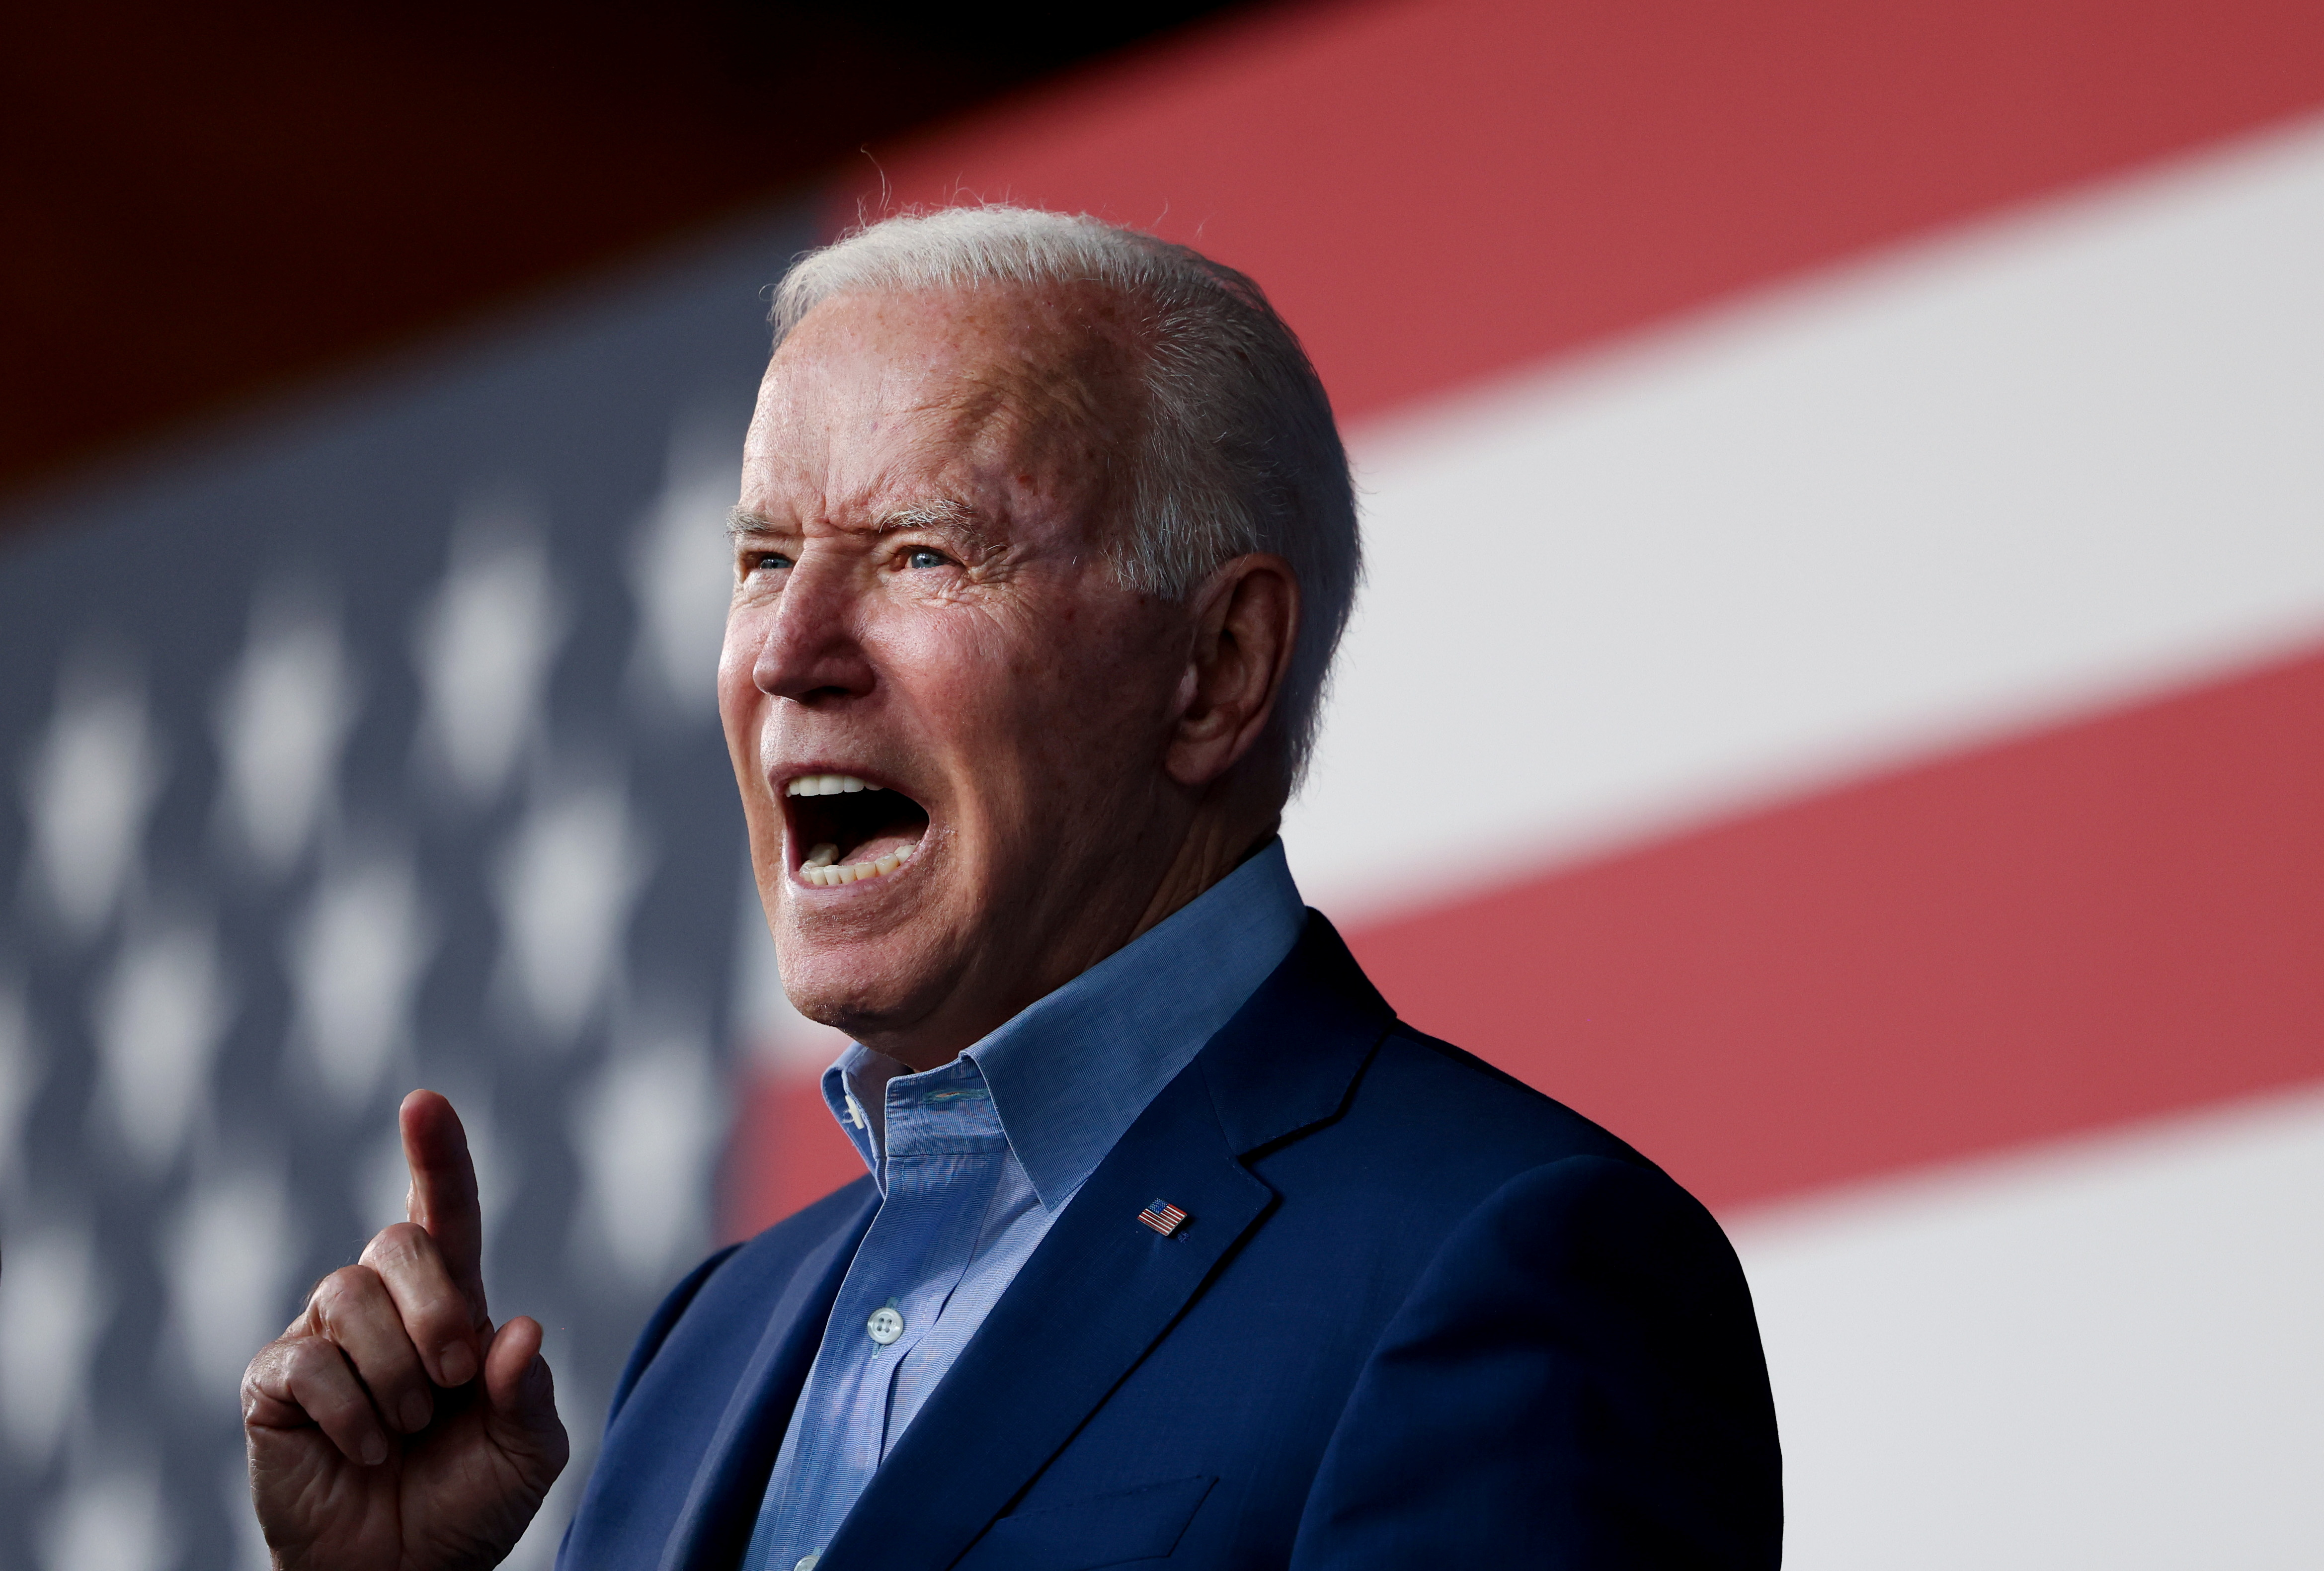 U.S. President Joe Biden participates in a campaign event for Virginia gubernatorial candidate Terry McAuliffe at Lubber Run Park in Arlington, Virginia, U.S., July 23, 2021. REUTERS/Evelyn Hockstein